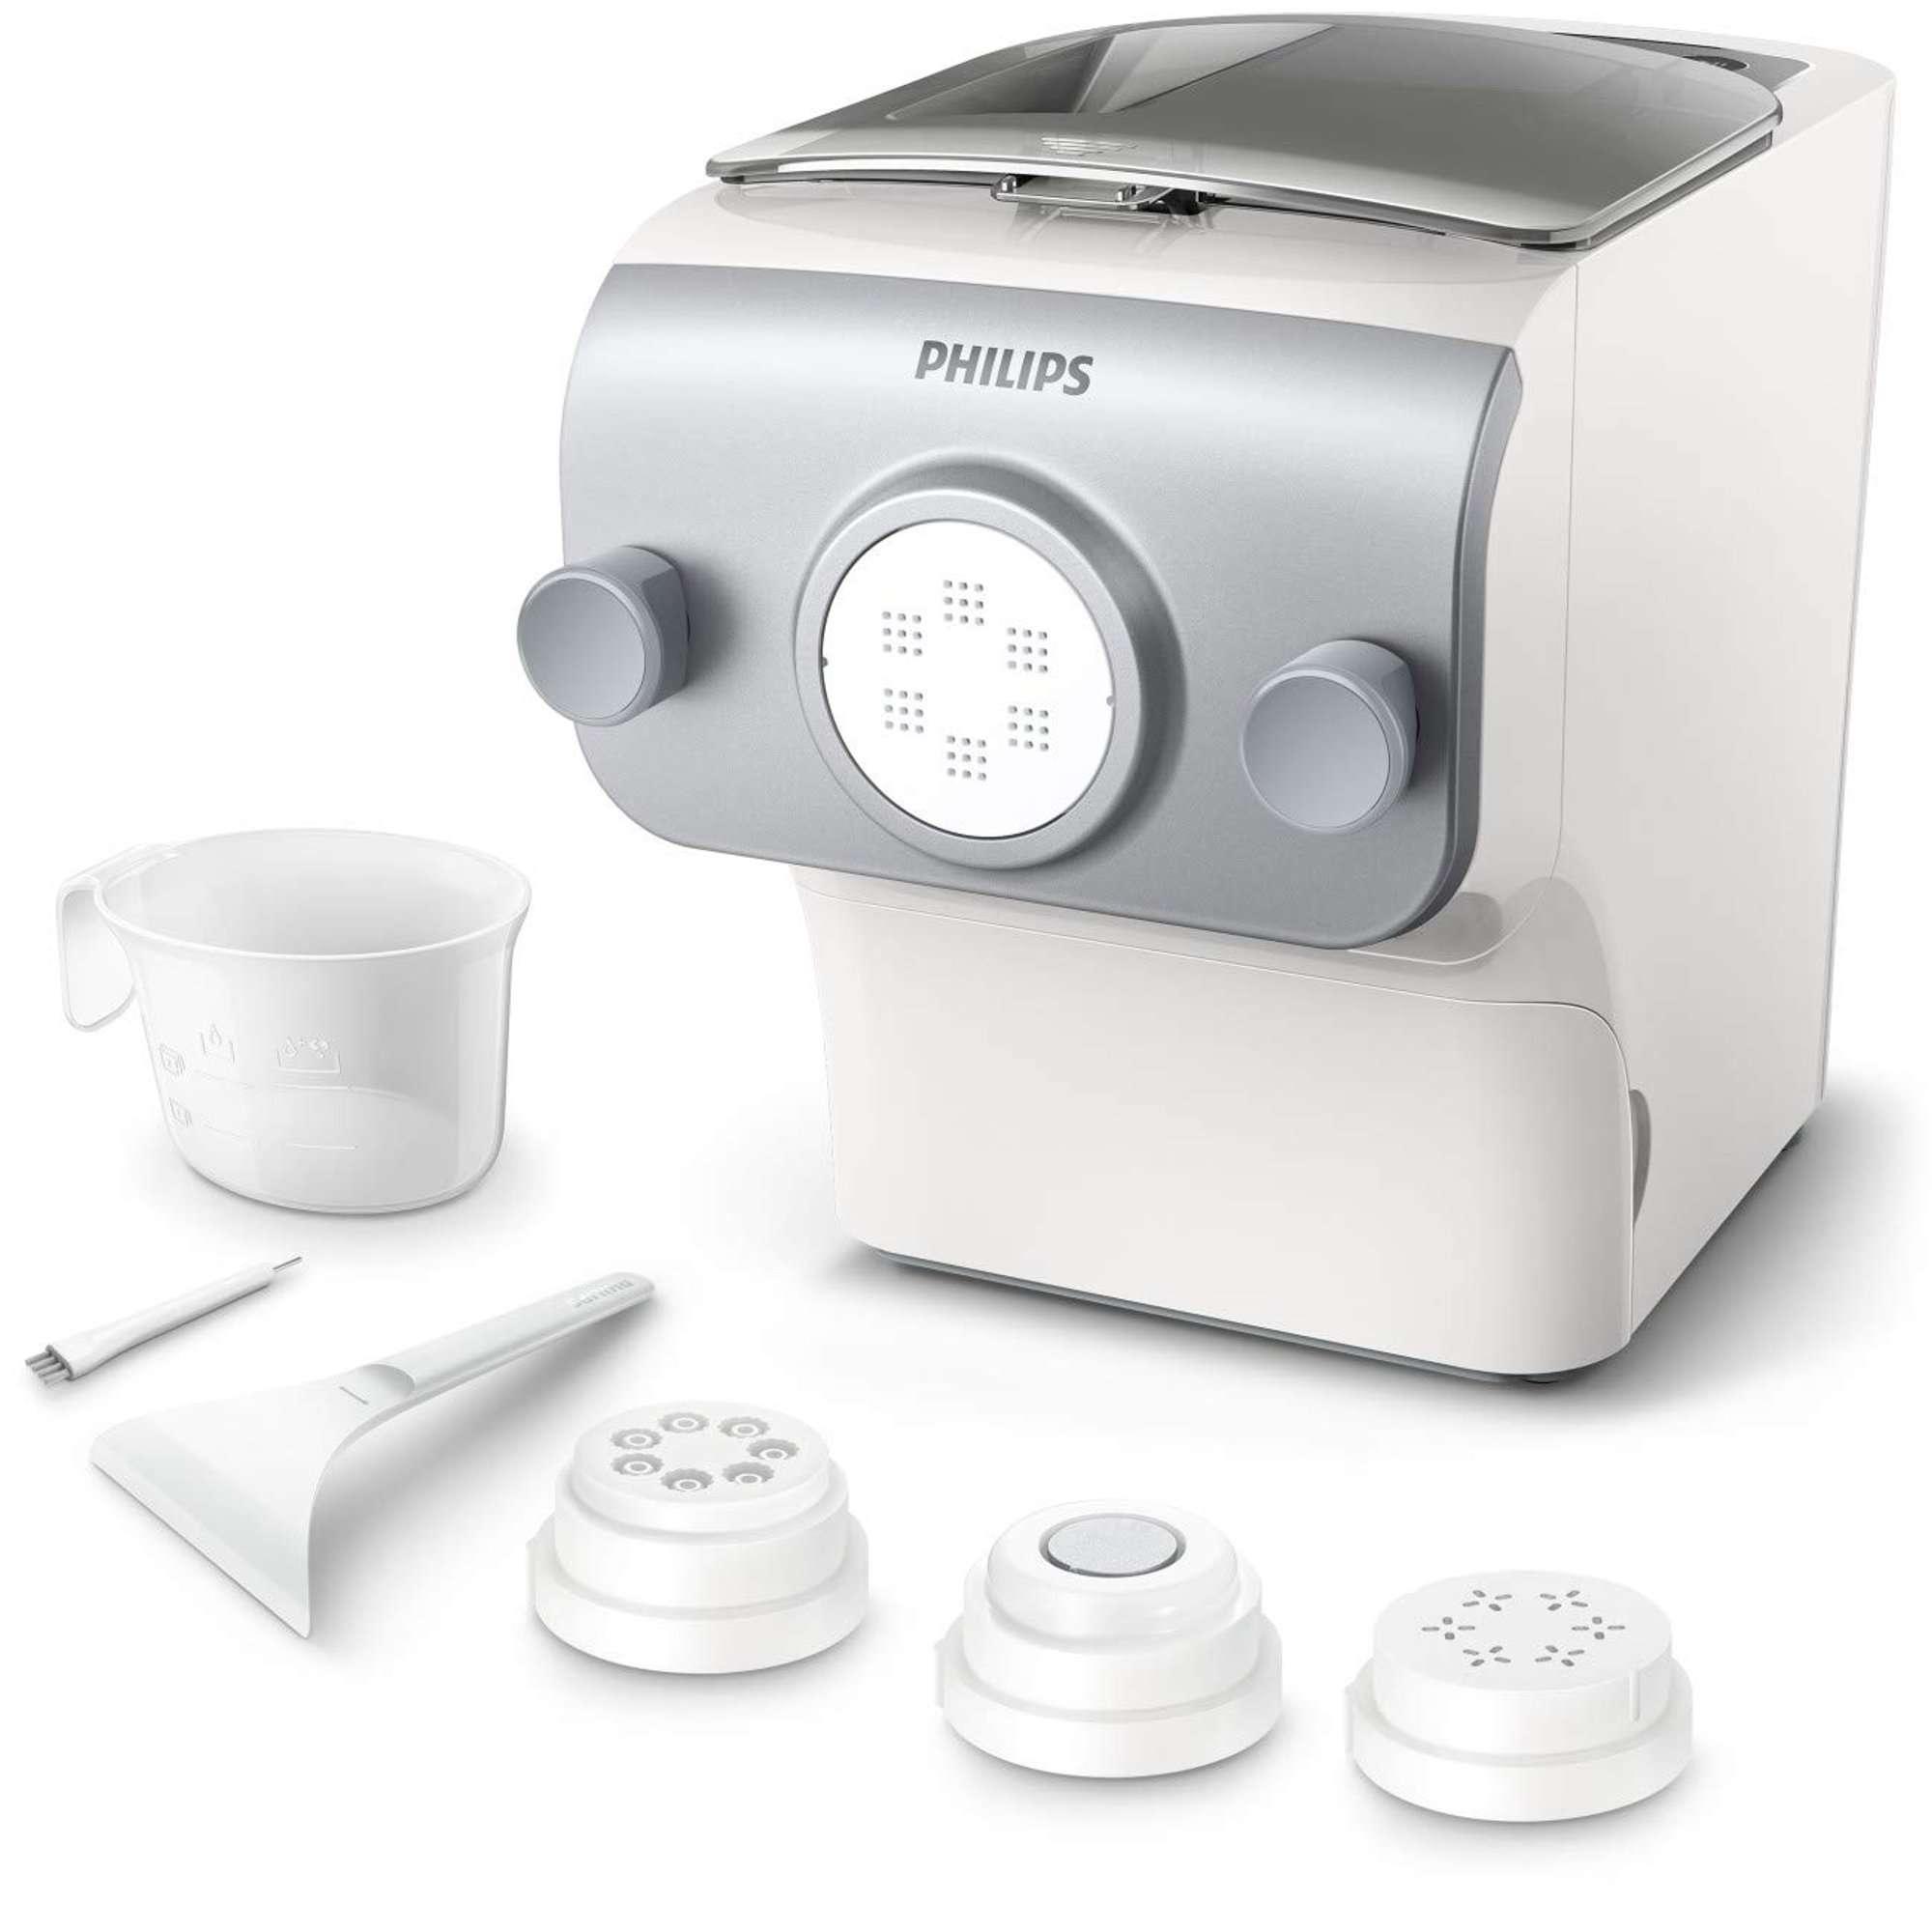 Philips Kitchen Appliances Pasta and Noodle Maker HR2357/05